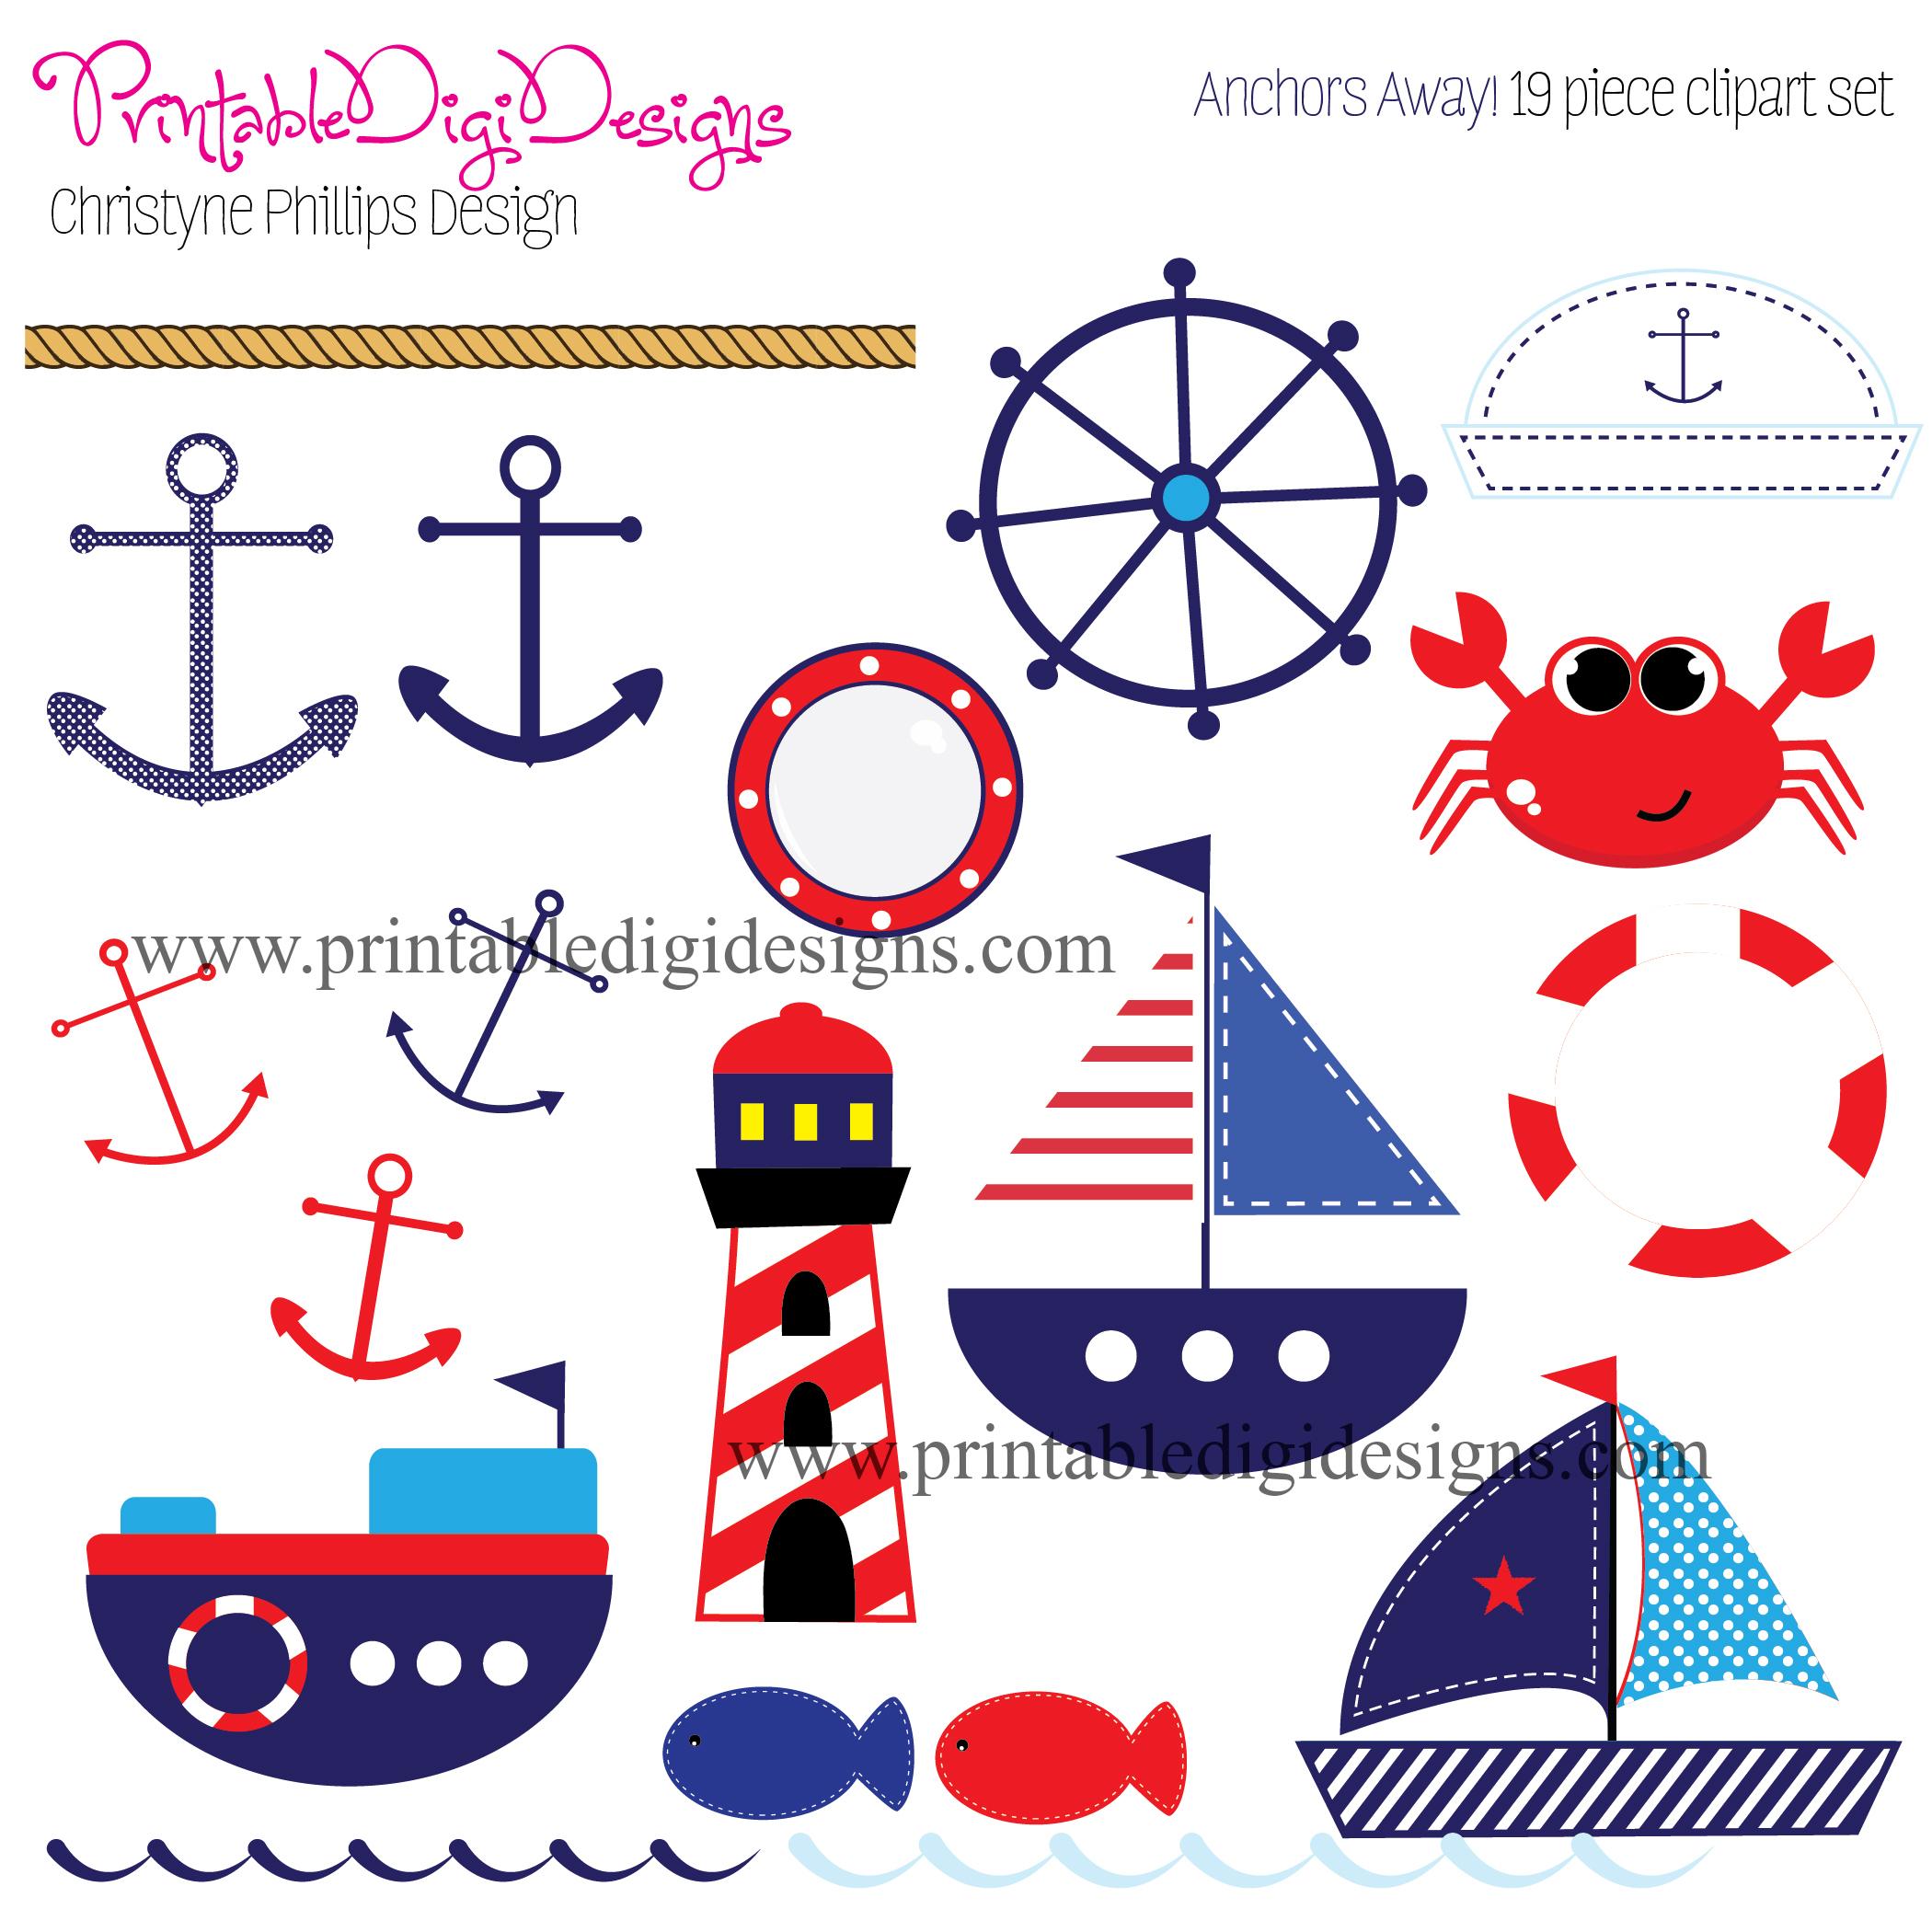 Kids Nautical Clipart Anchors Away Nauti-Kids Nautical Clipart Anchors Away Nautical Clipart-18